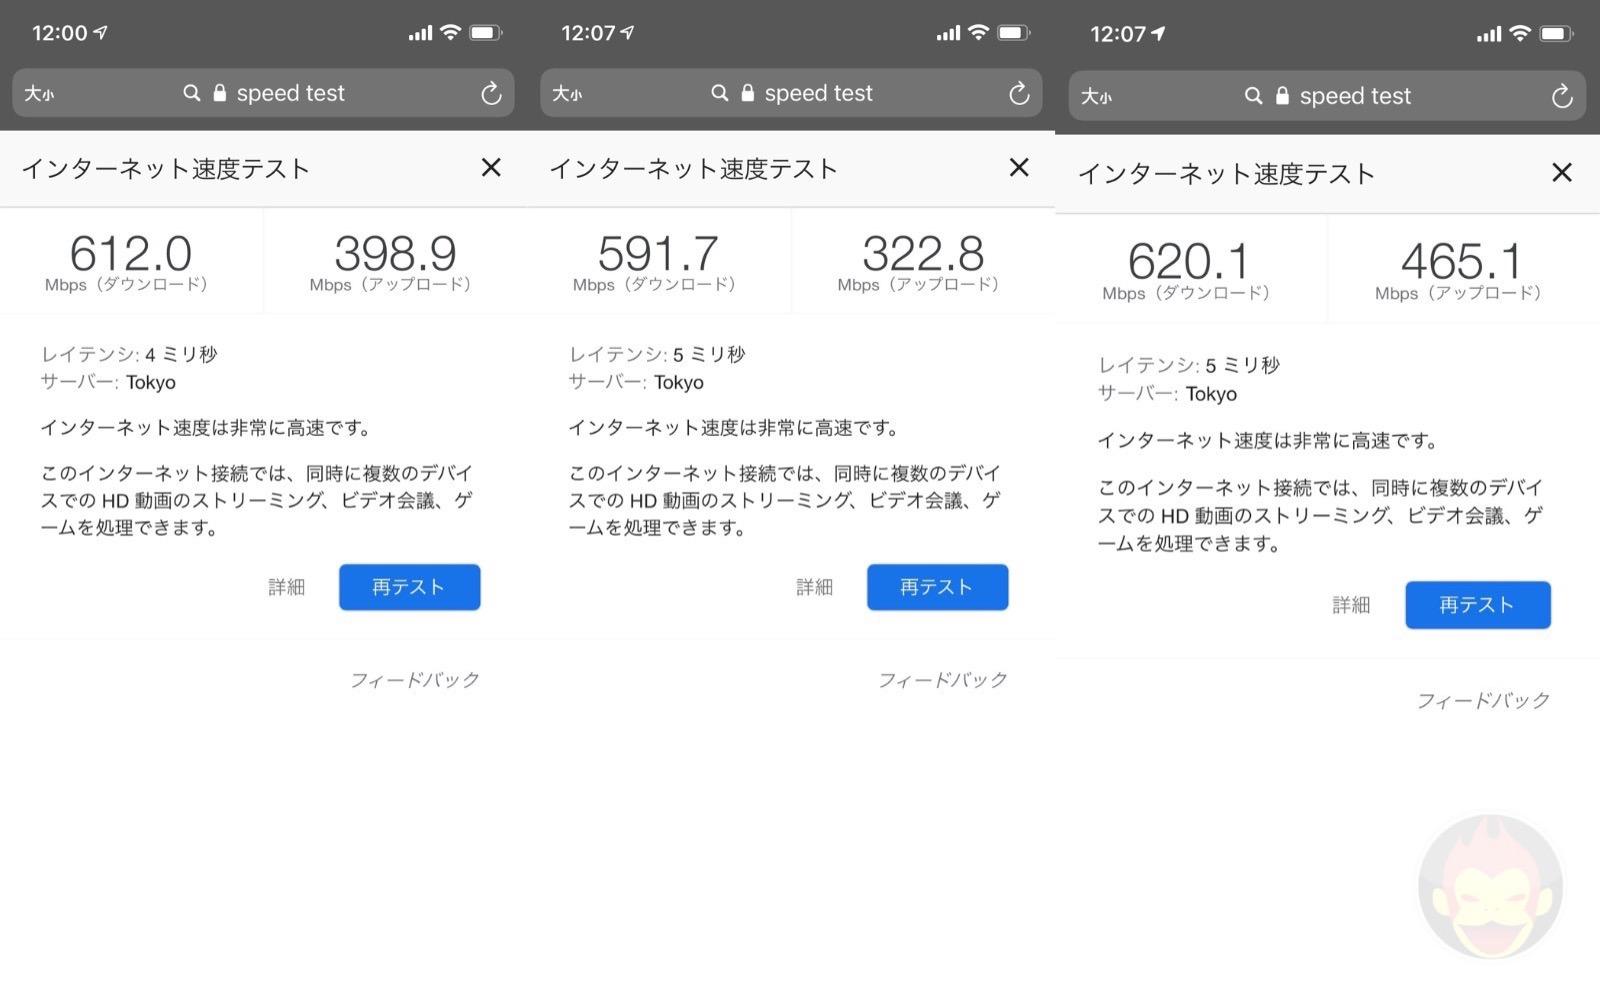 NetSpeed-on-iPhone-With-WiFi6.jpg